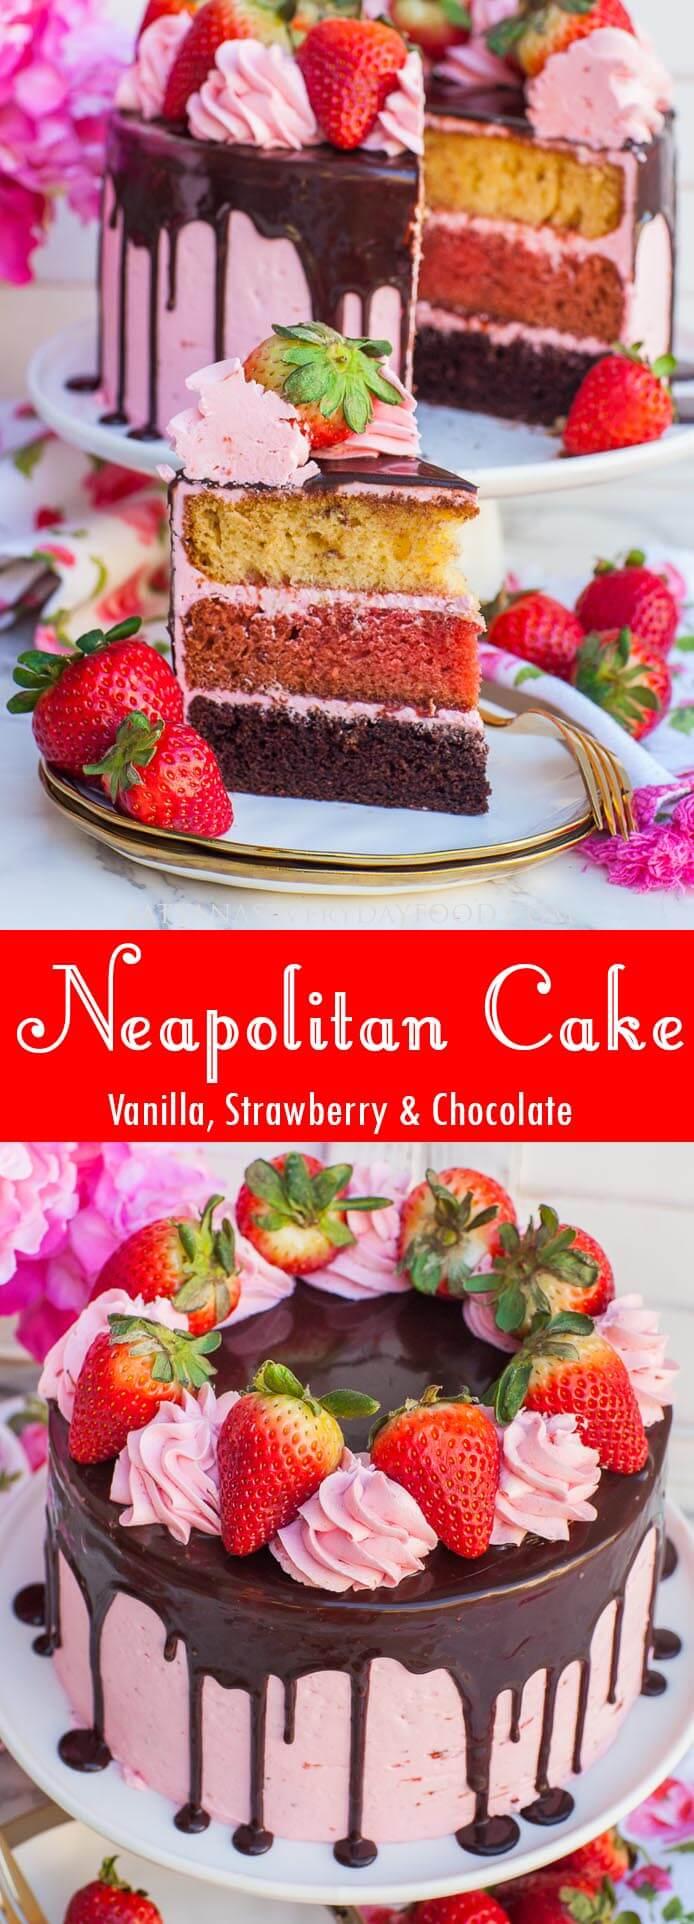 Neapolitan Cake video recipe